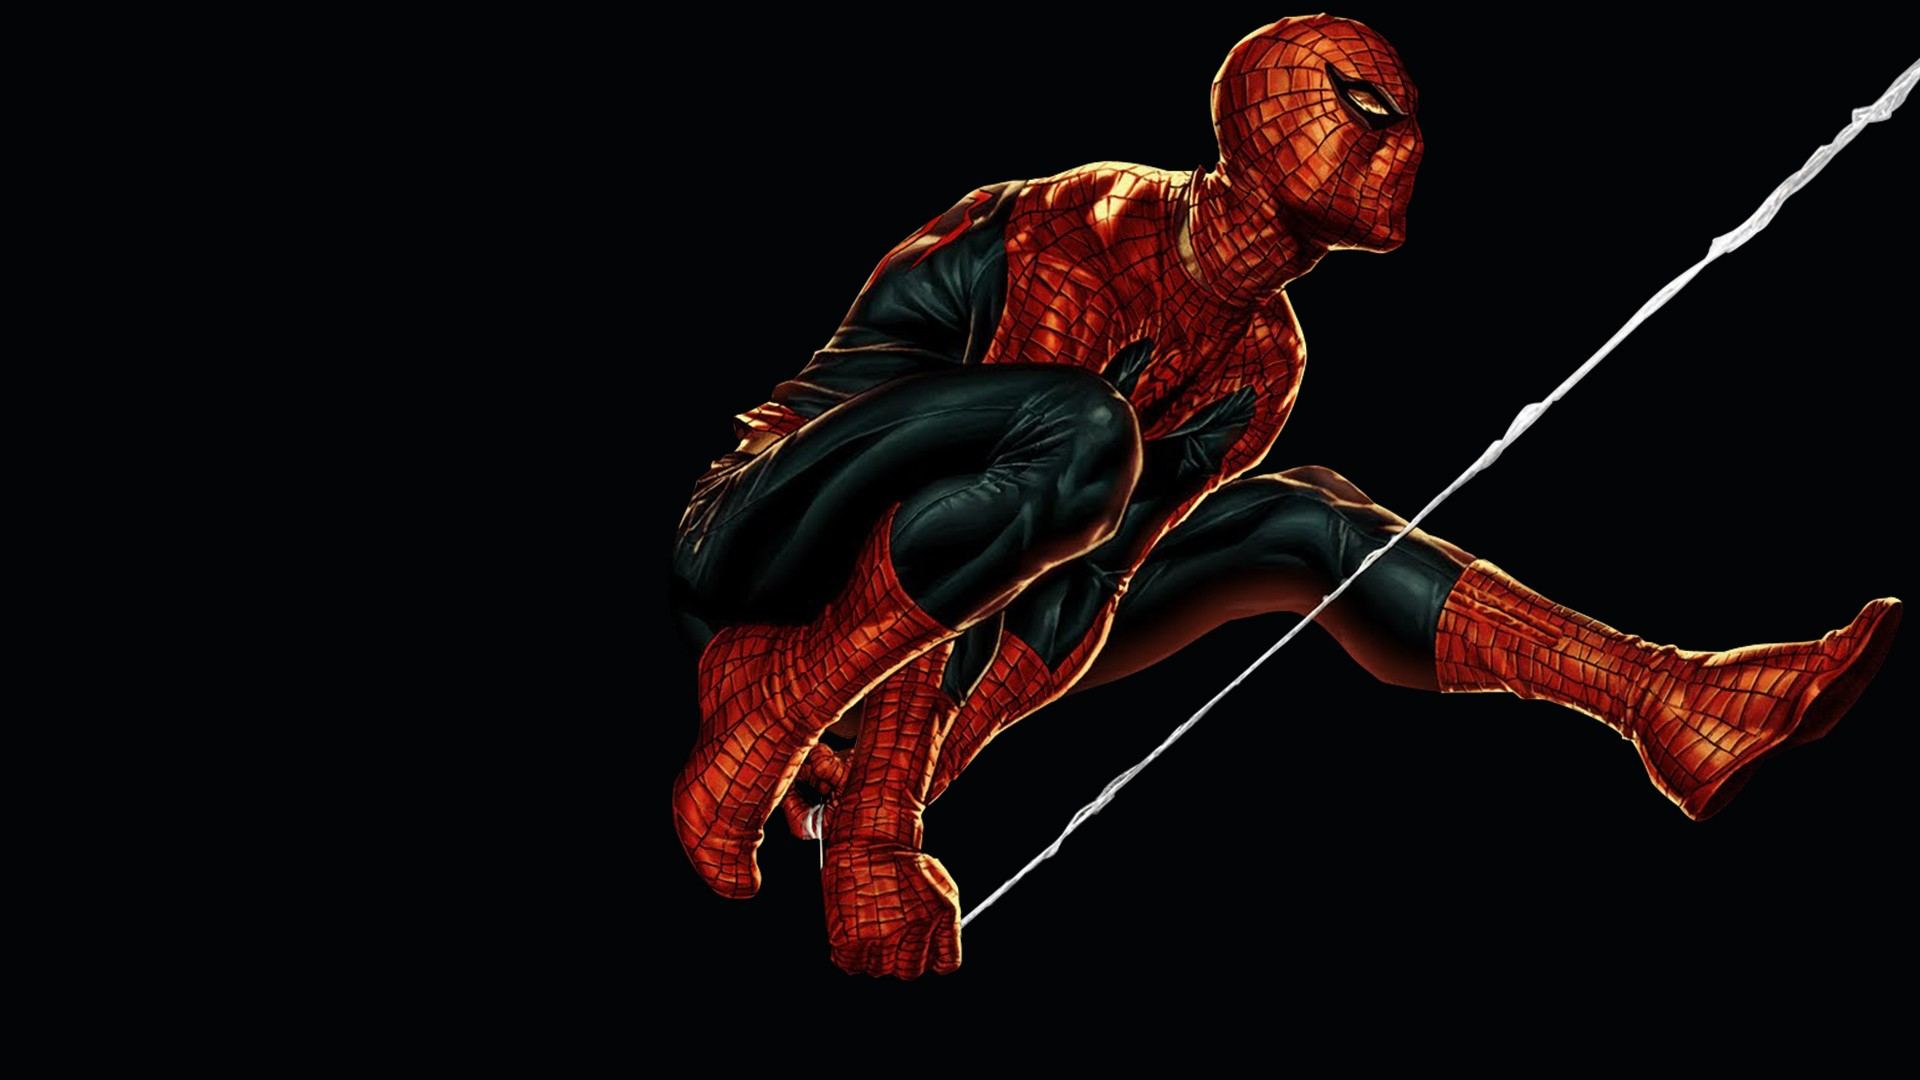 marvel comics wallpaper spider - photo #46